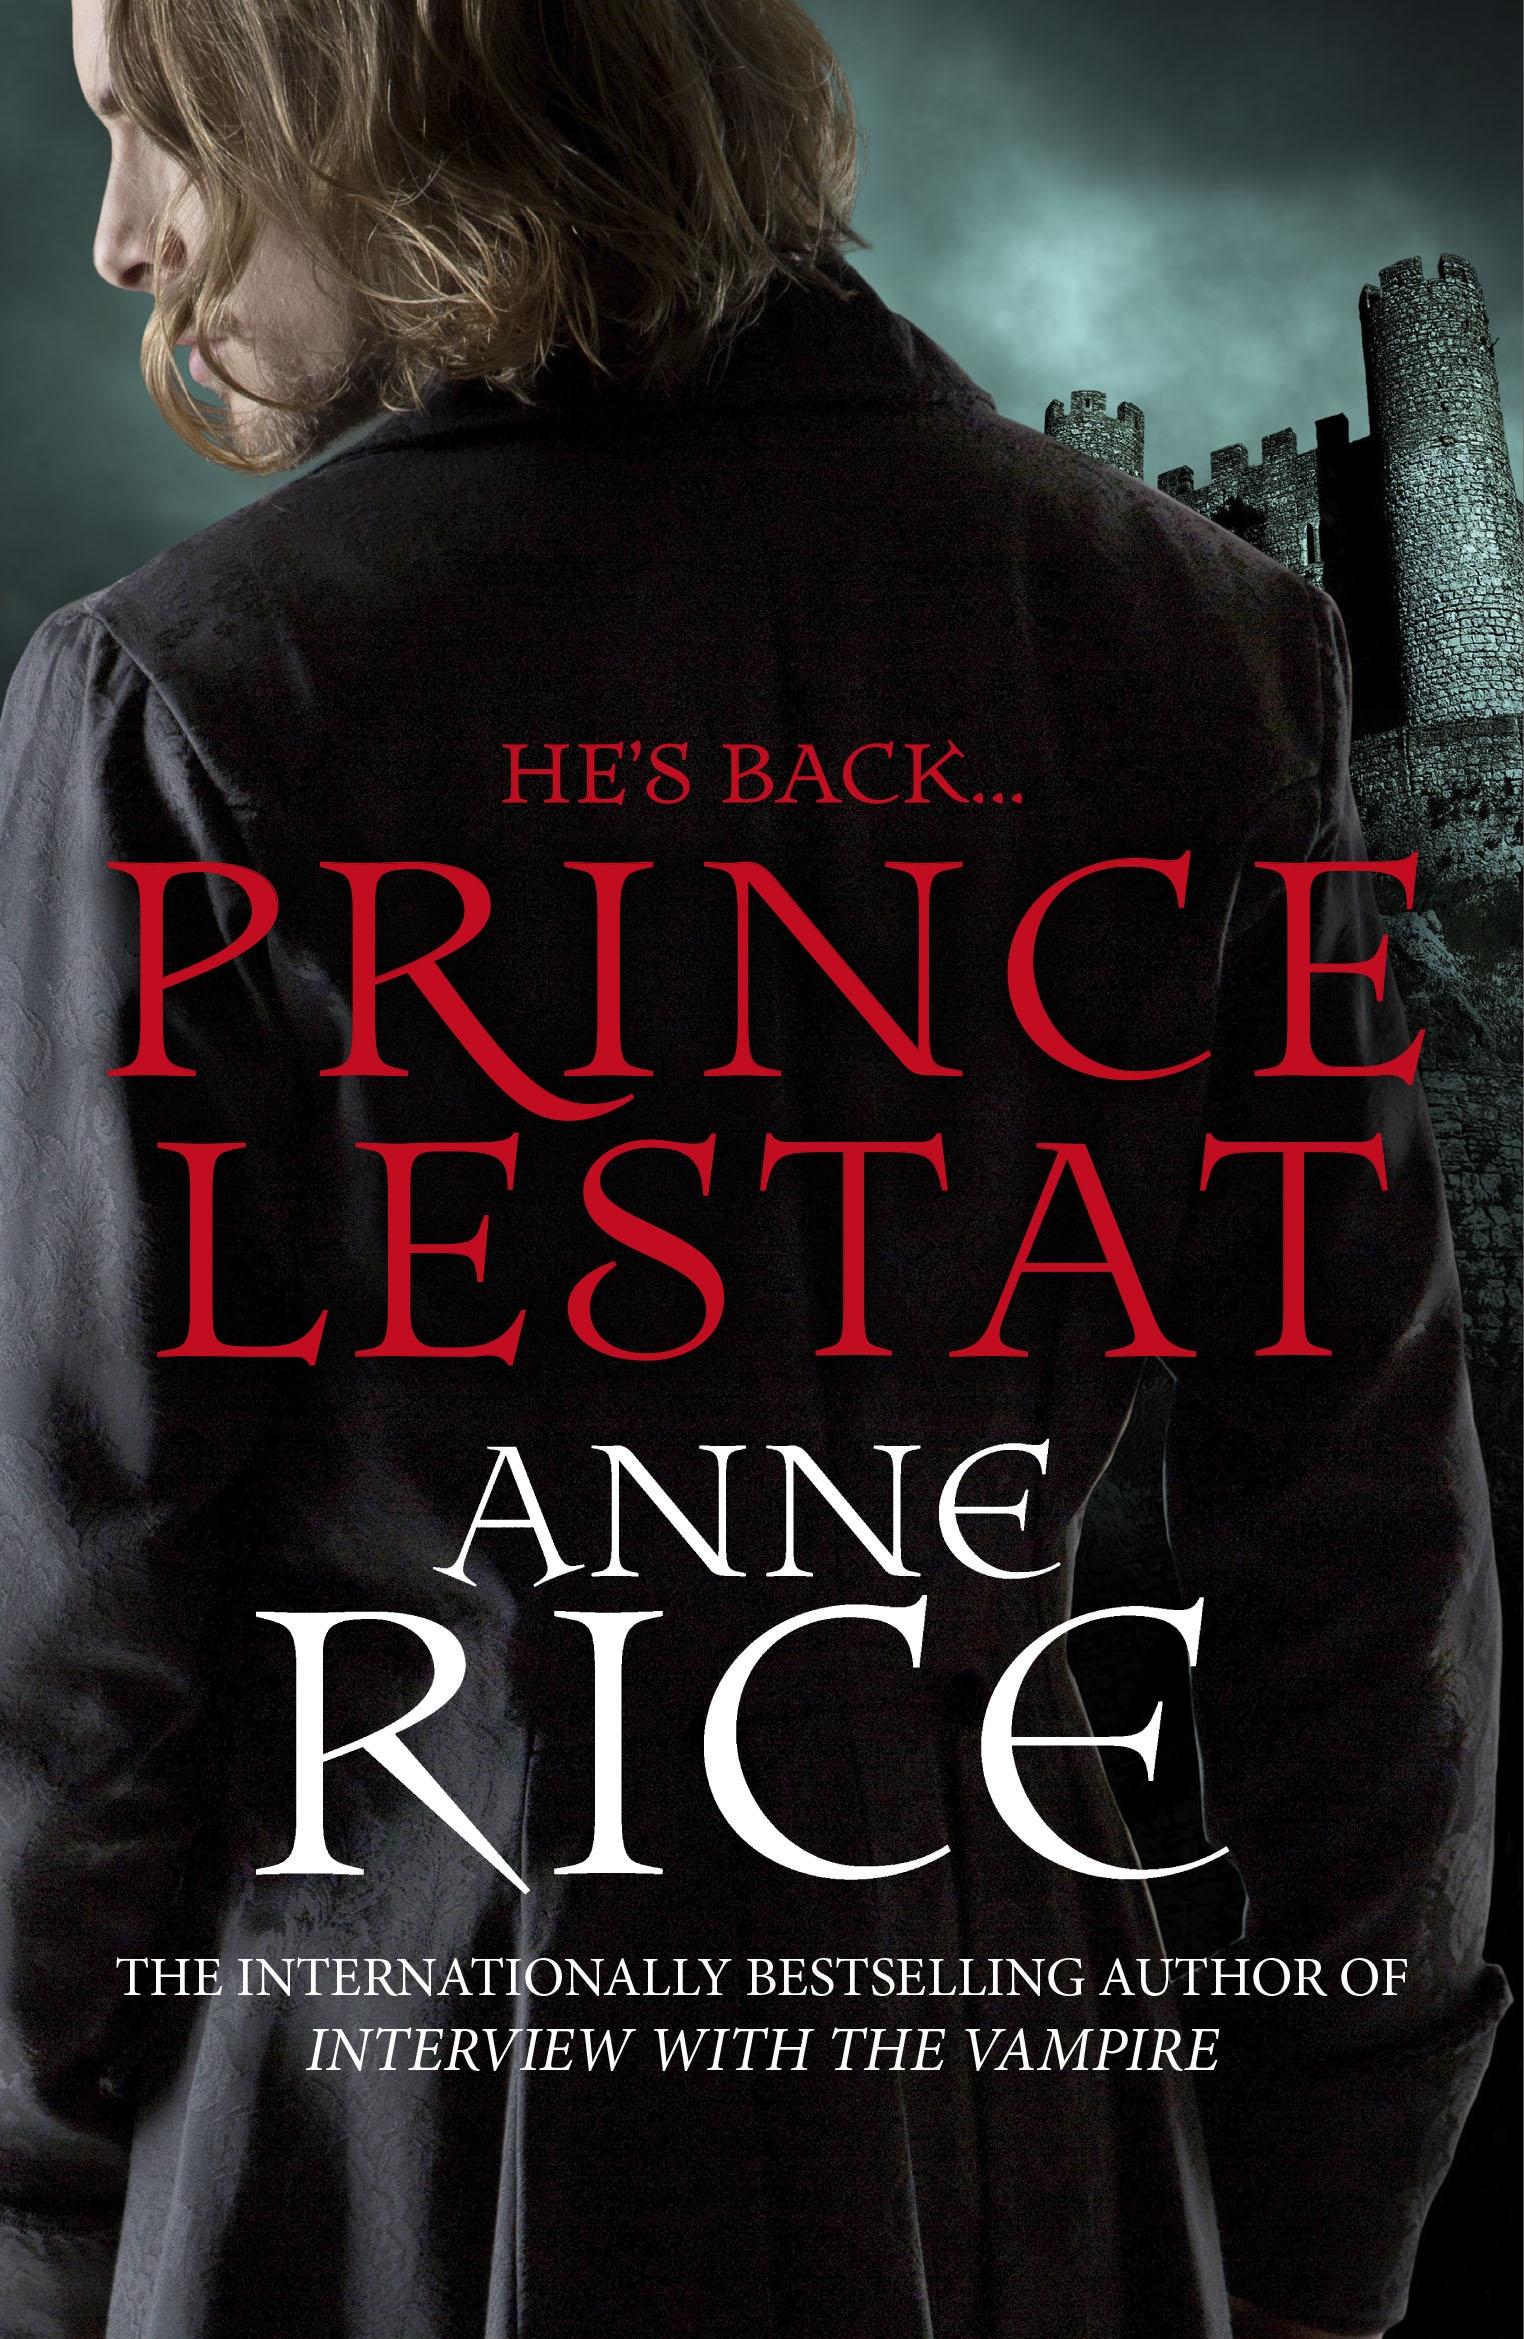 Book Cover Design Vampire : Prince lestat penguin books new zealand